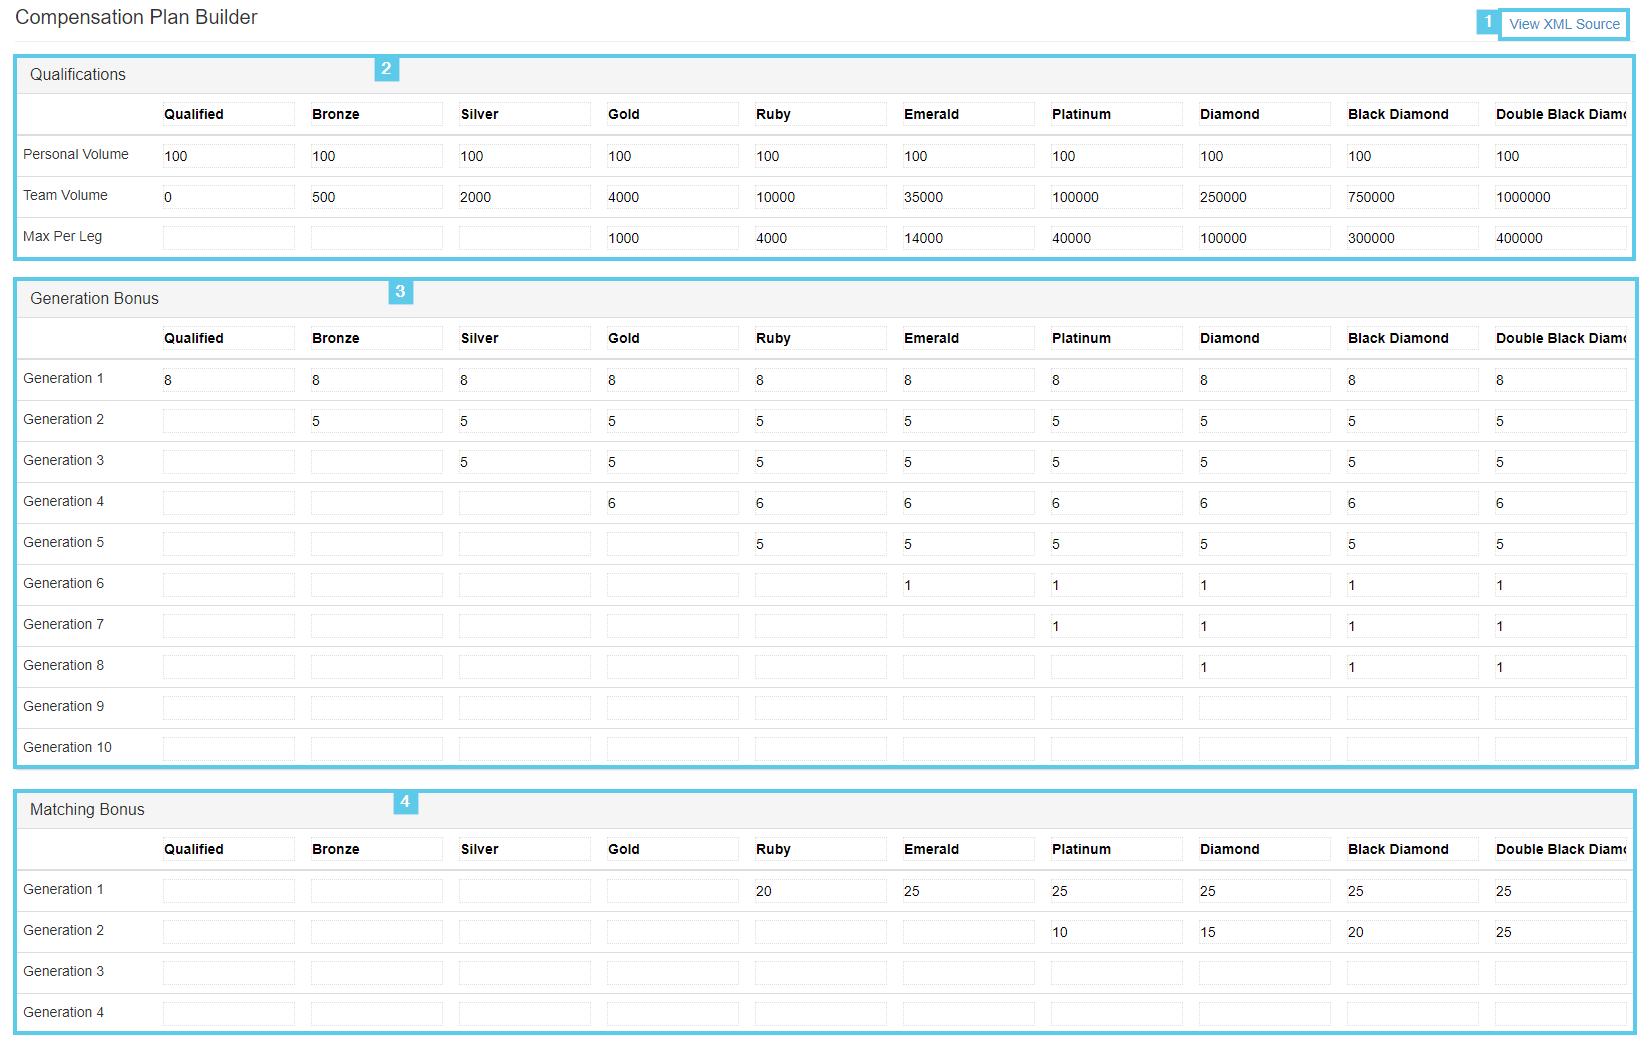 Edit Compensation Plan page elements (Click to enlarge)